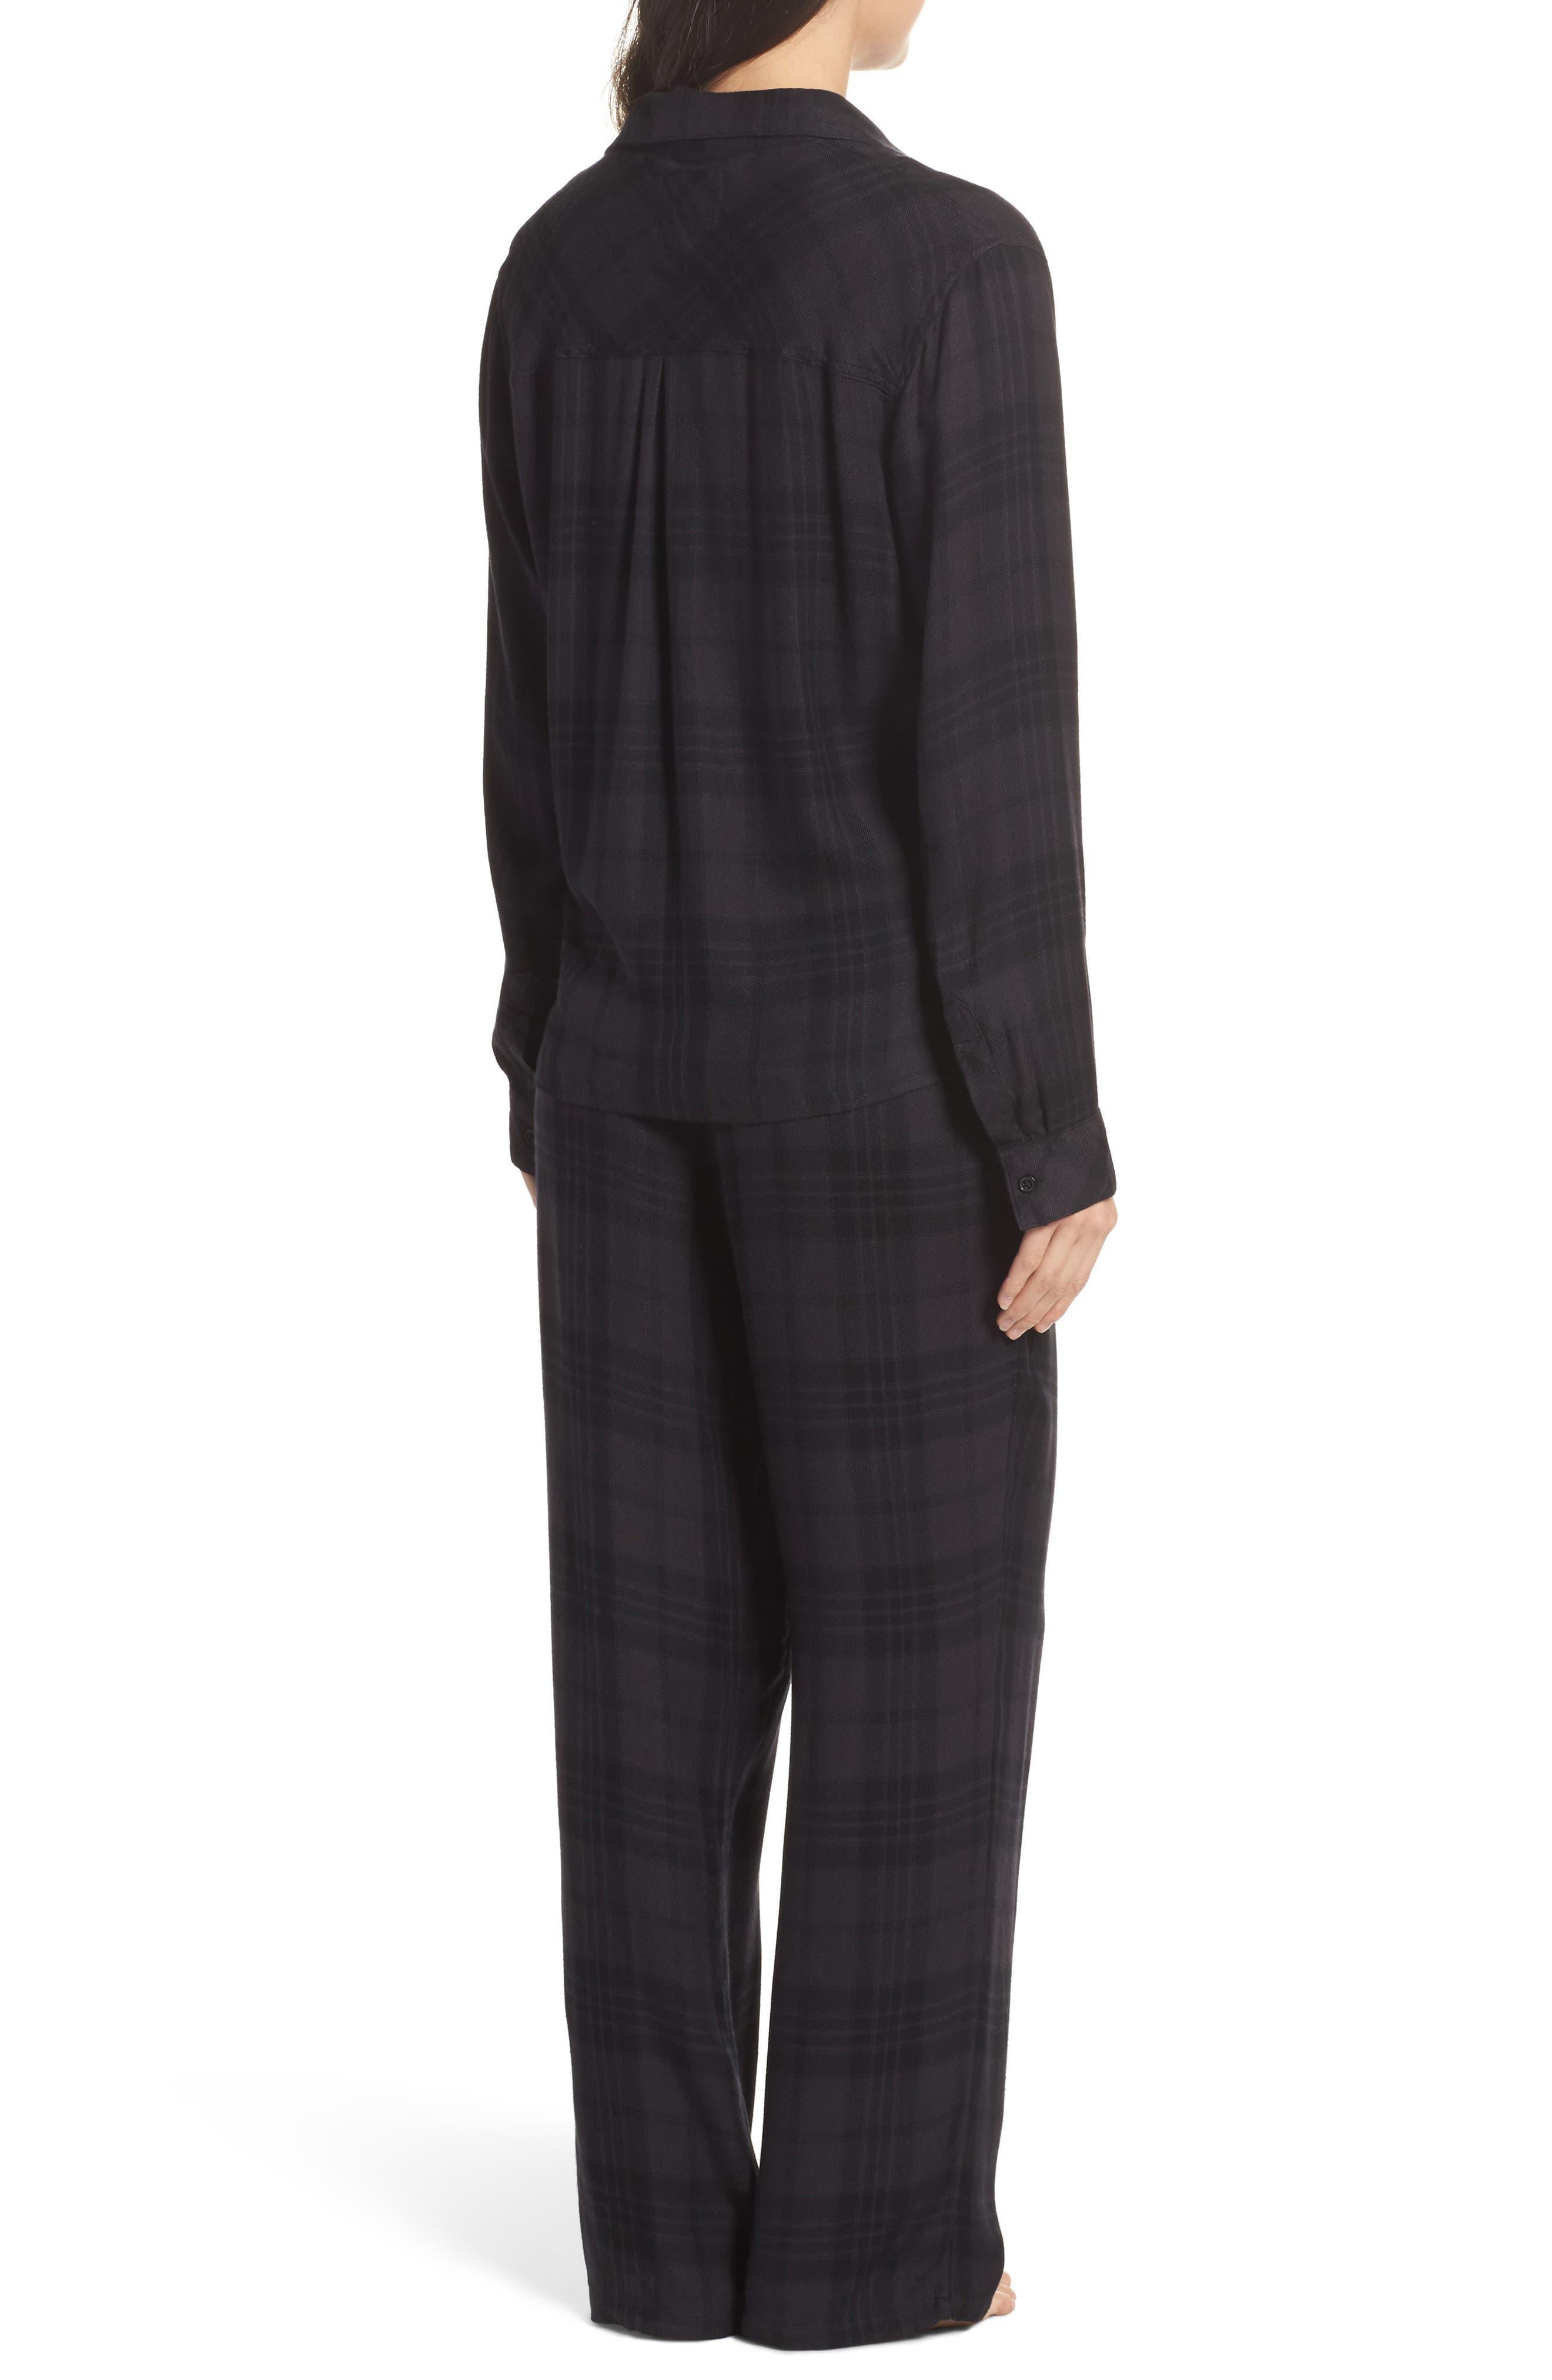 Plaid Pajamas,                             Alternate thumbnail 2, color,                             Onyx/ Jet